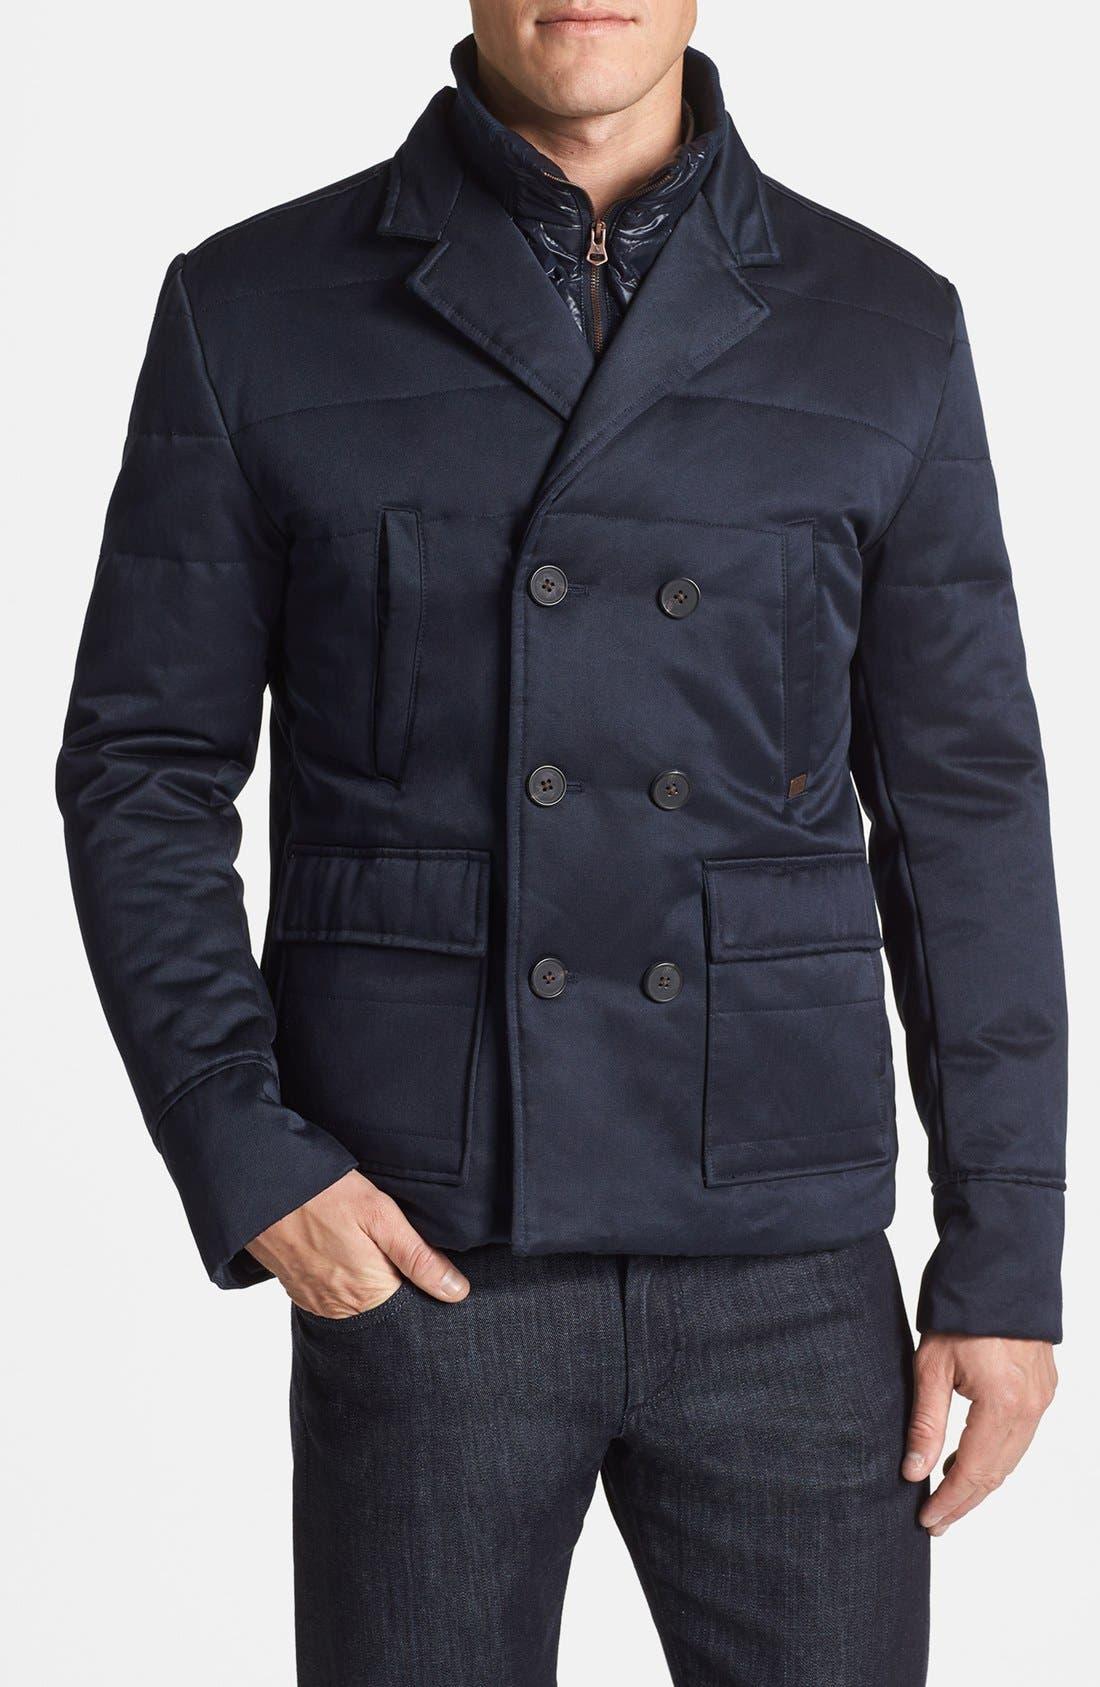 Main Image - Antony Morato Slim Fit Double Breasted Jacket